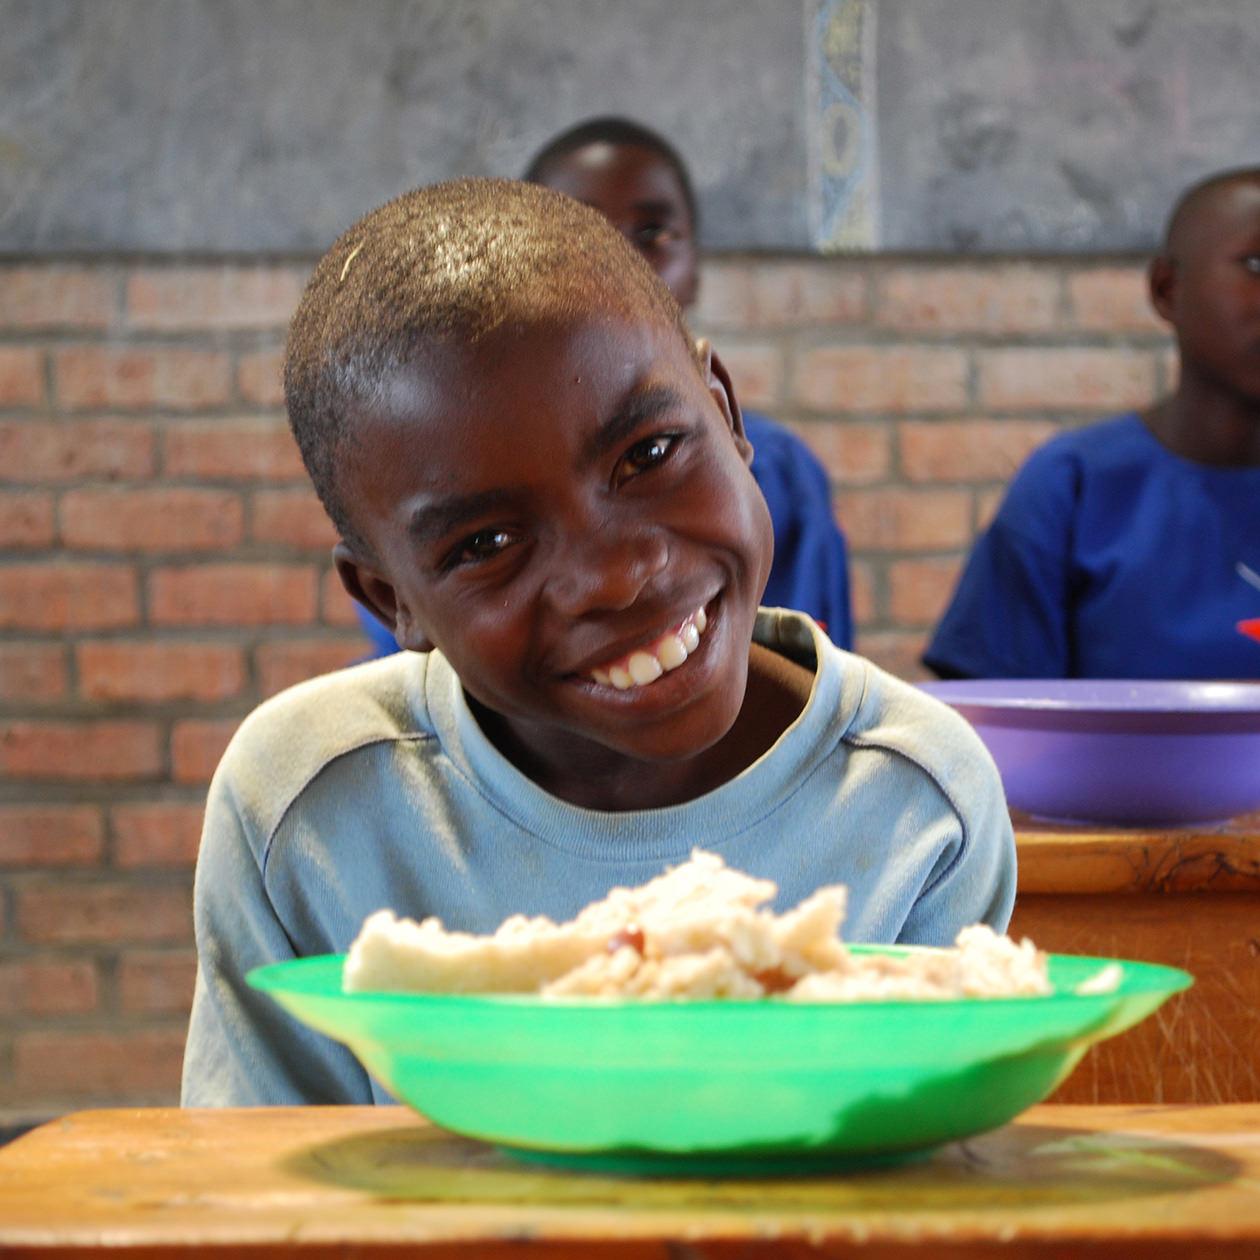 開発途上国の給食支援